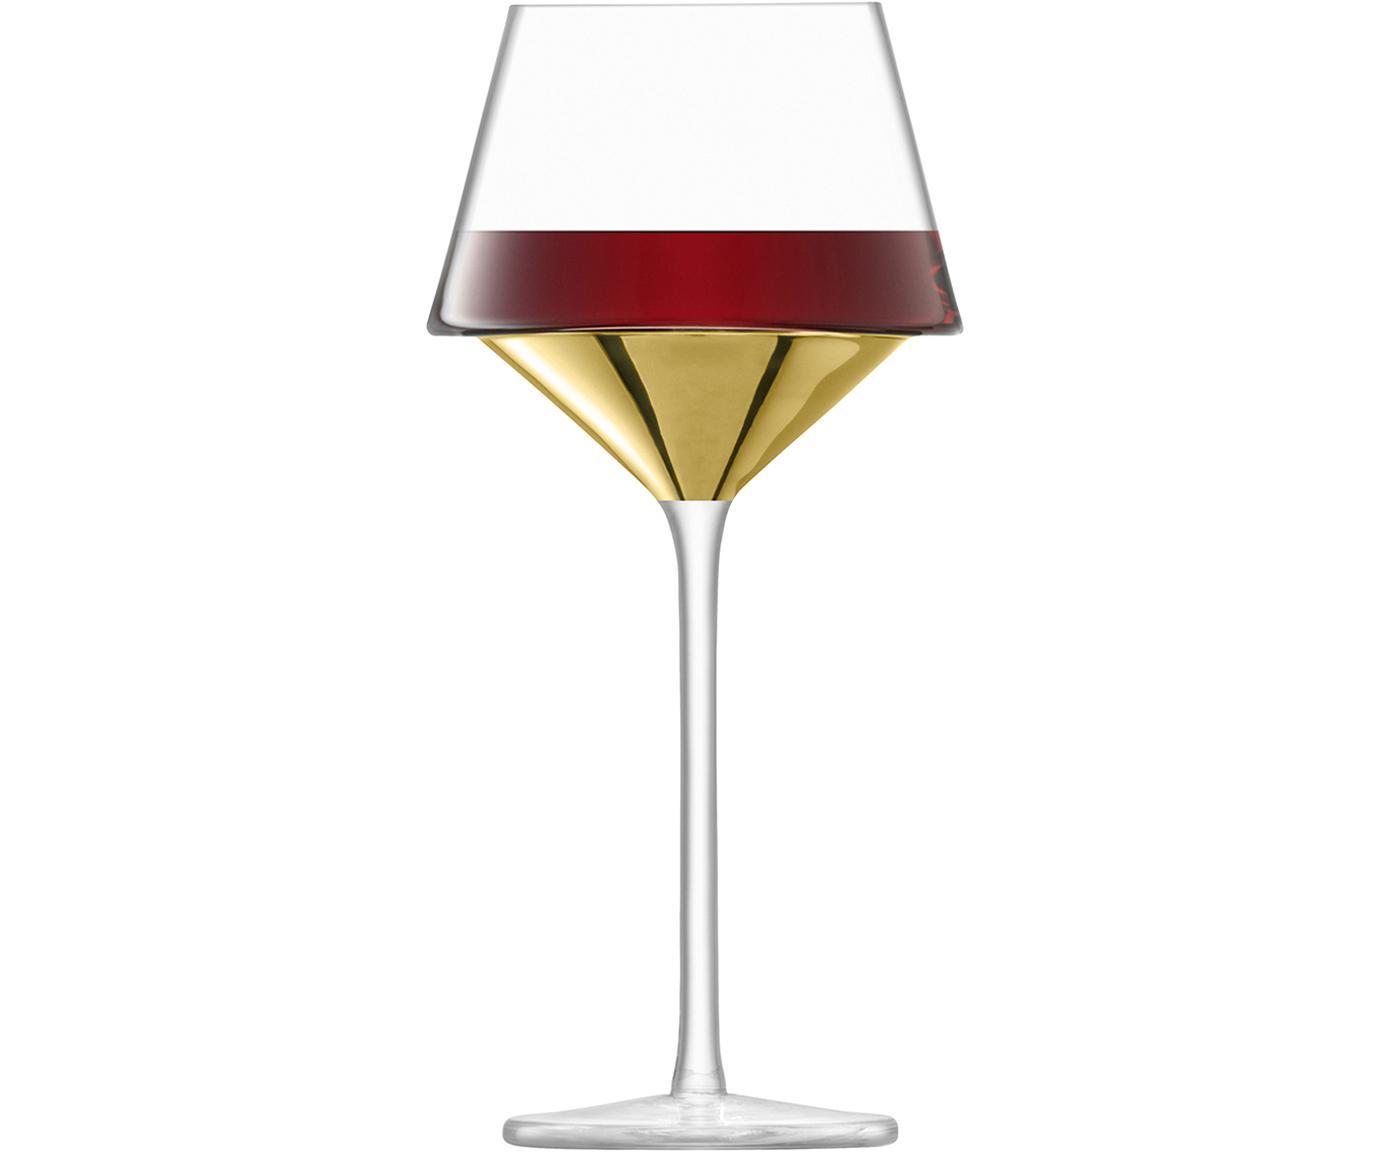 Mondgeblazen rode wijnglazen Space, 2 stuks, Glas, Transparant, goudkleurig, Ø 11 x H 23 cm